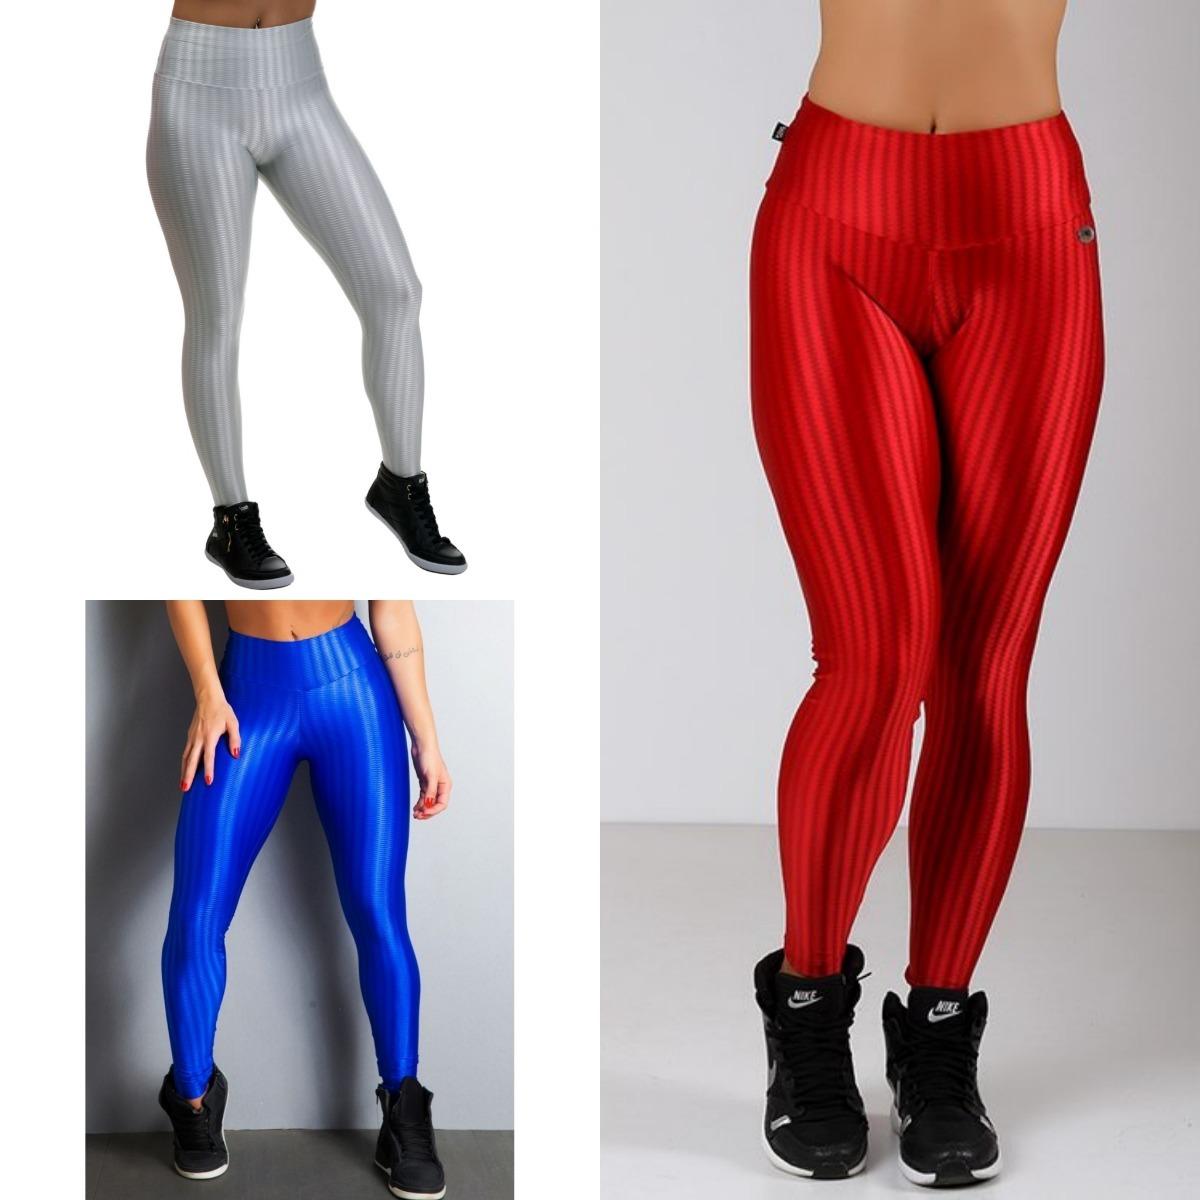 0b38bc028 kit 3 calças legging 3d cirrê + short 3d cirre + brinde. Carregando zoom.